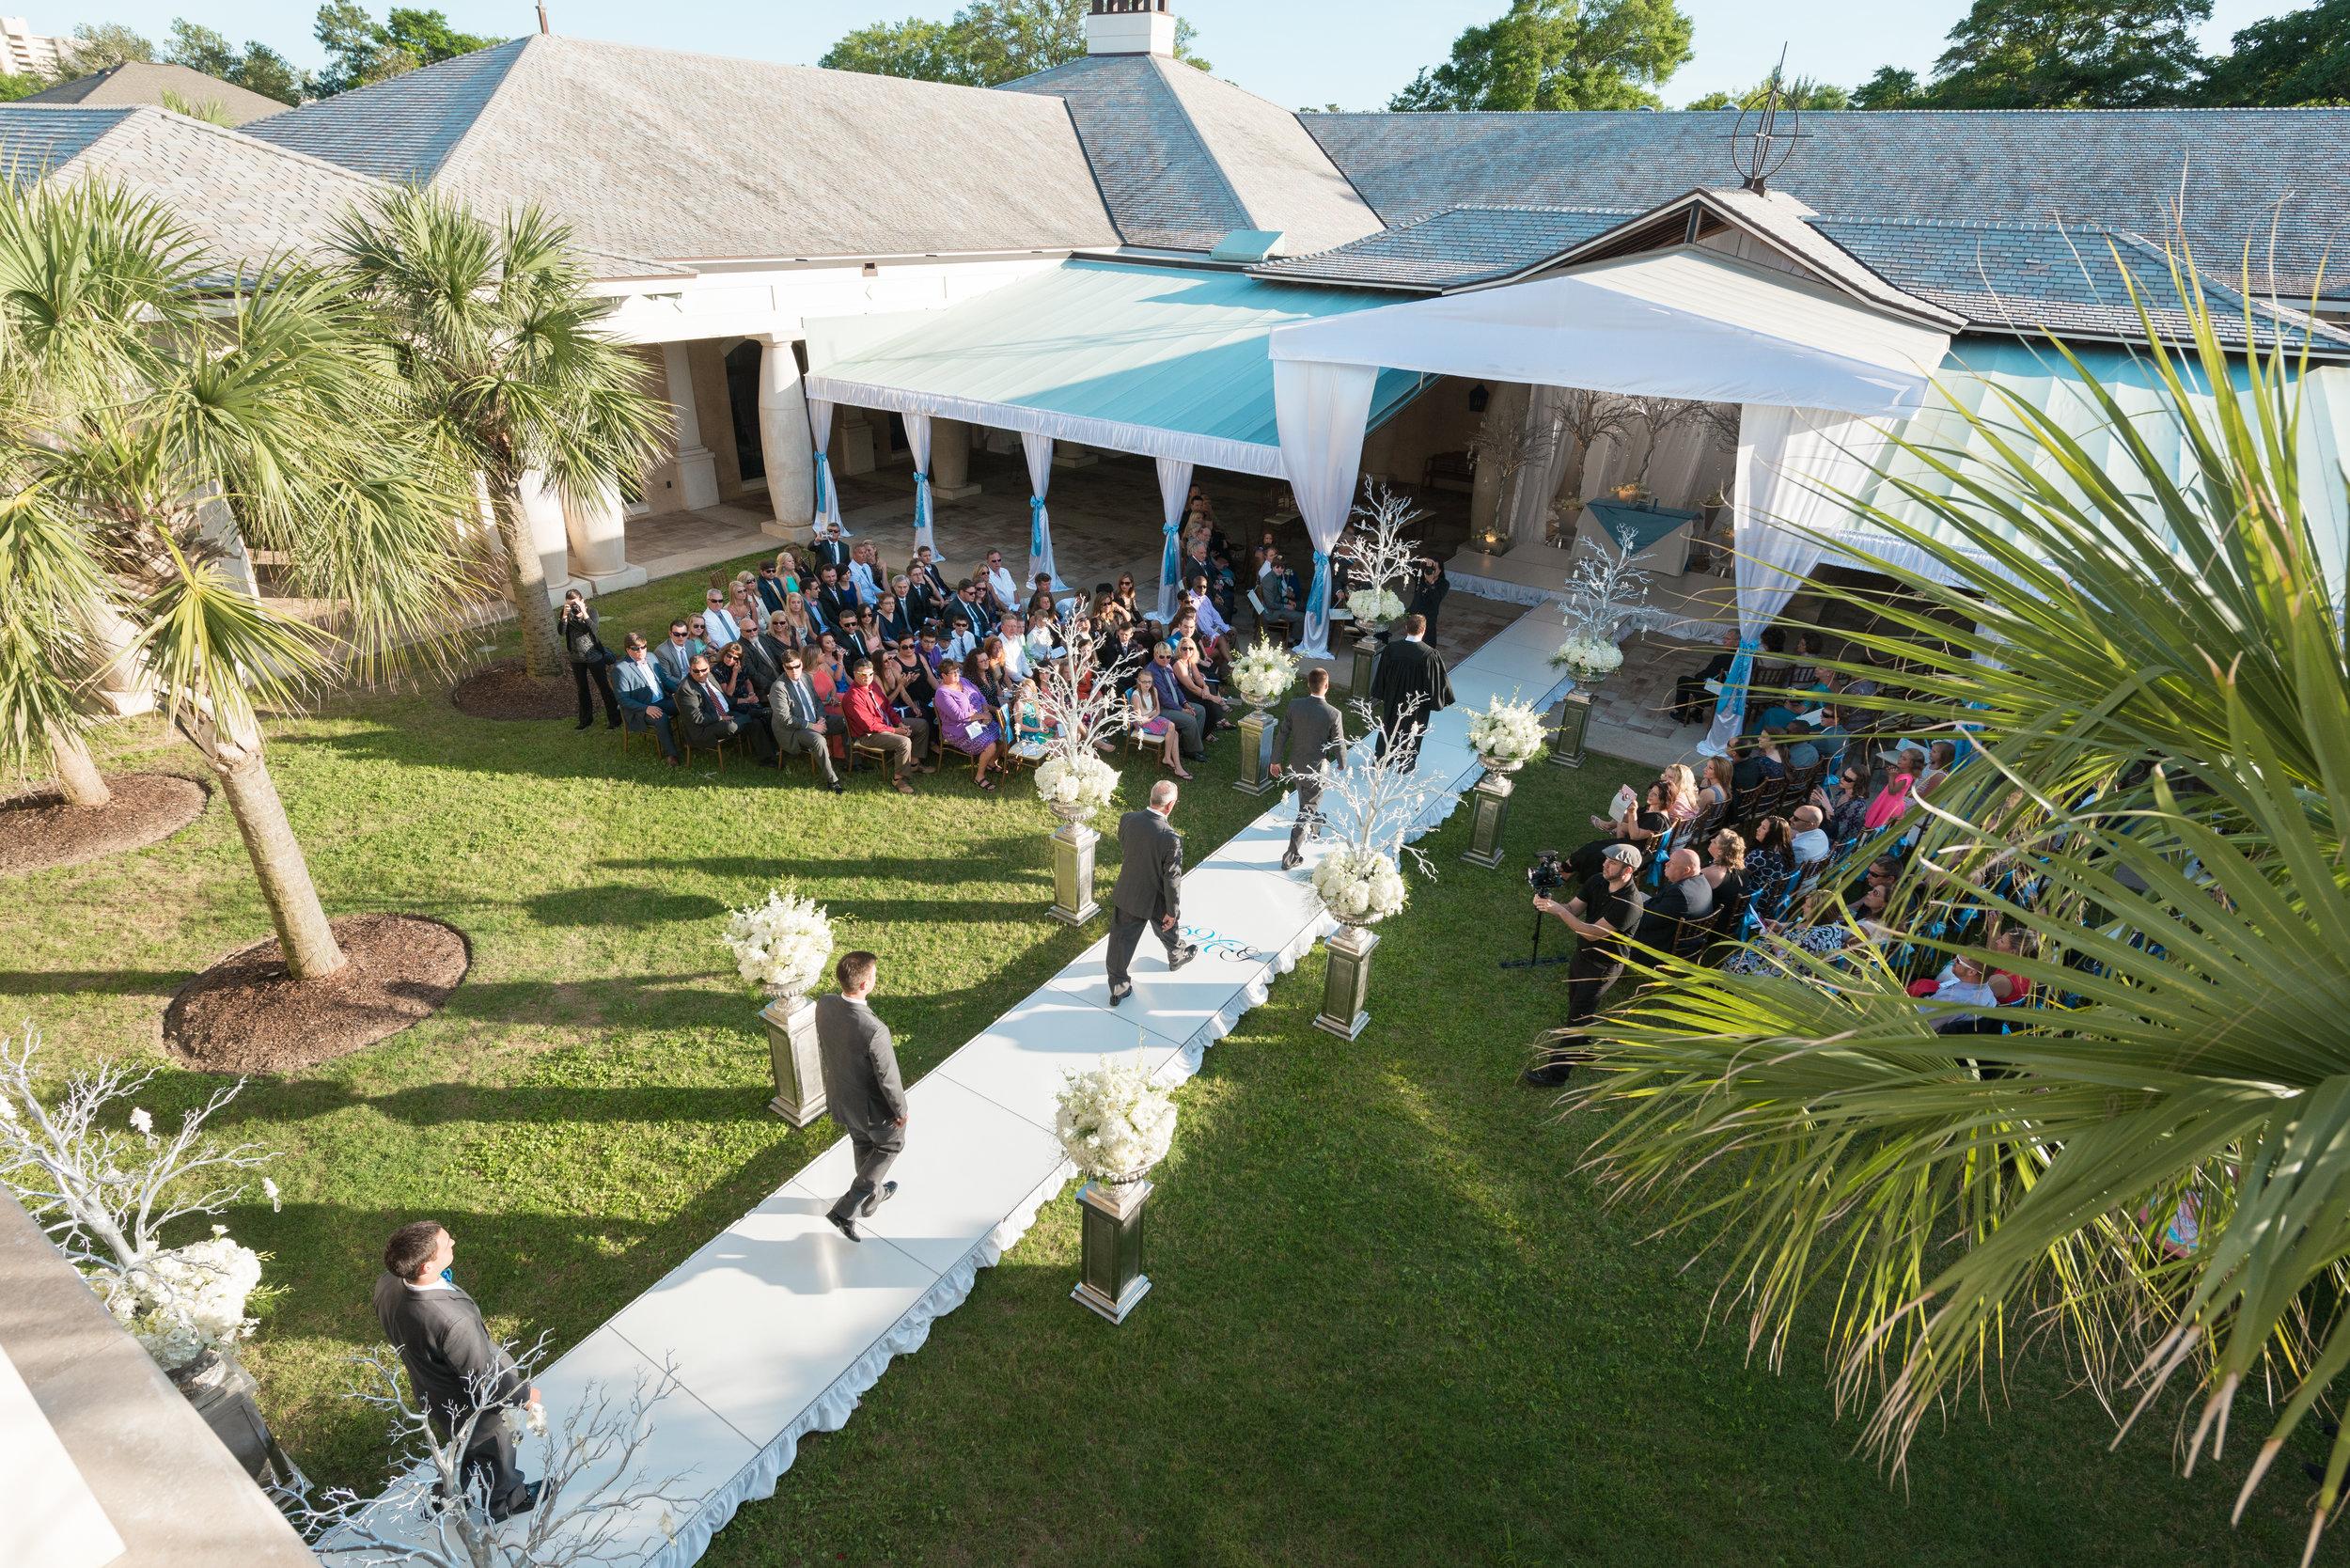 Carl-Kerridge-Photography-North-Beach-Wedding-May-2015-121.jpg